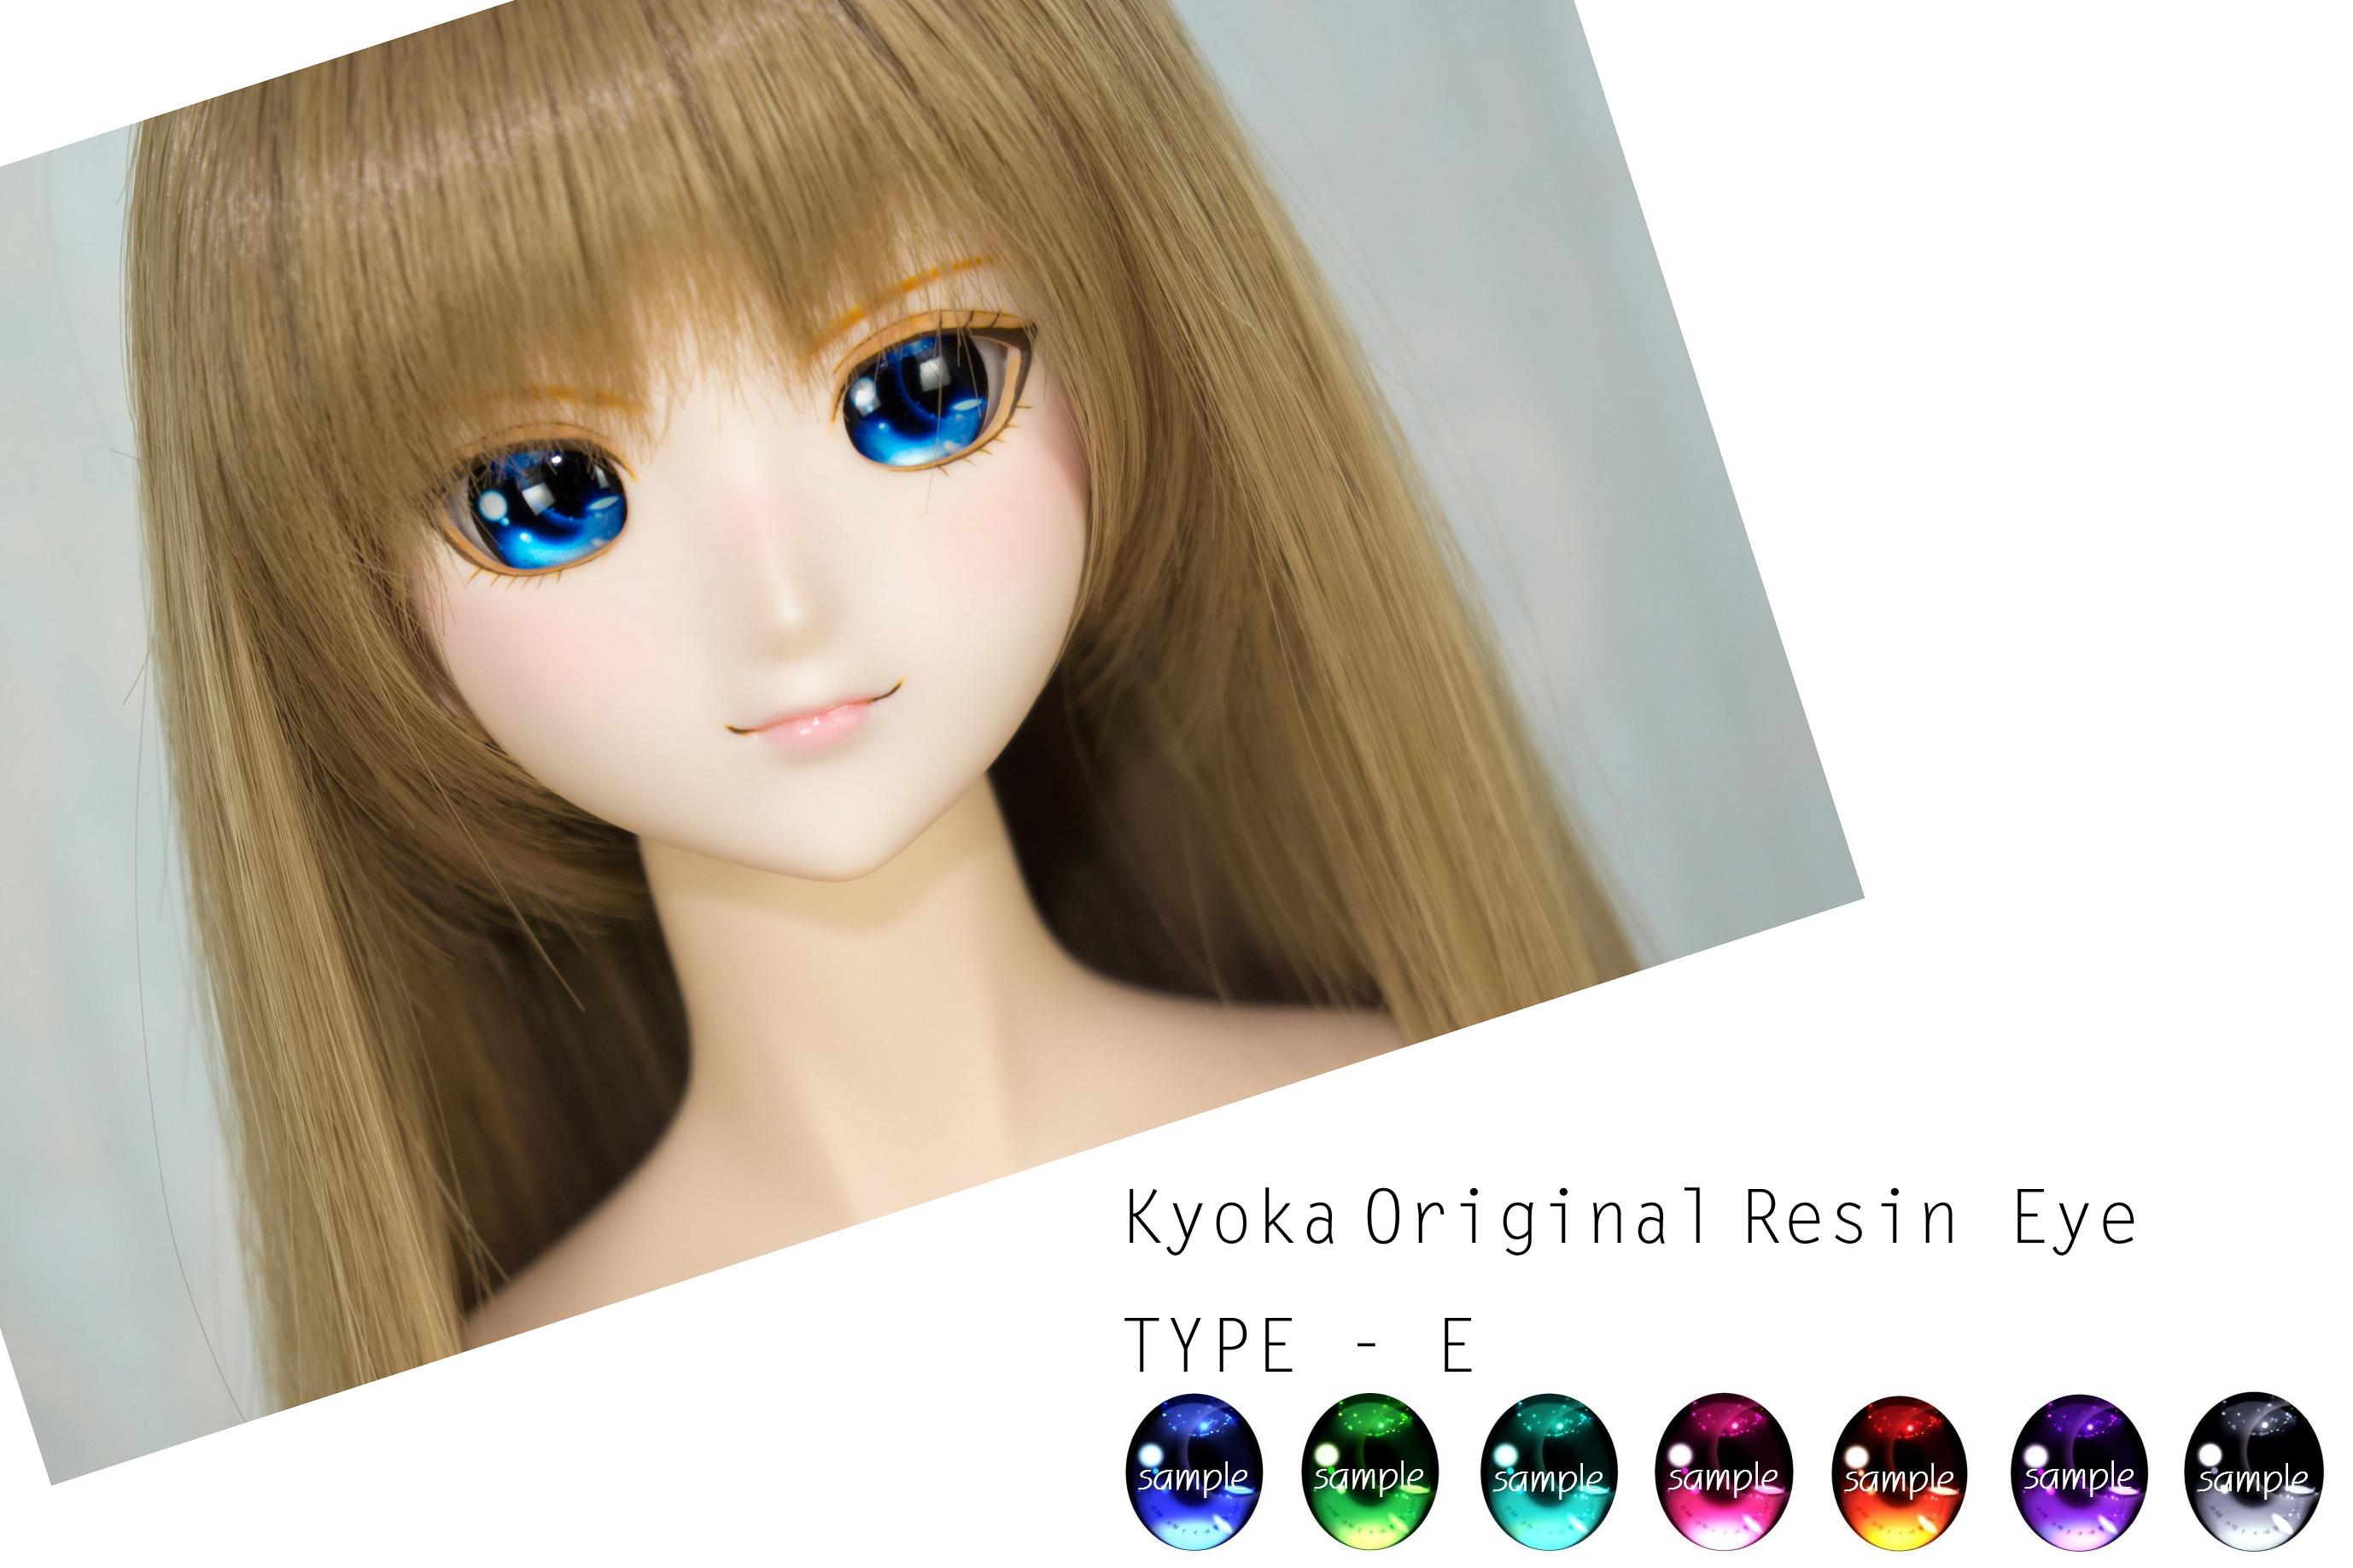 eye type E_sample_200